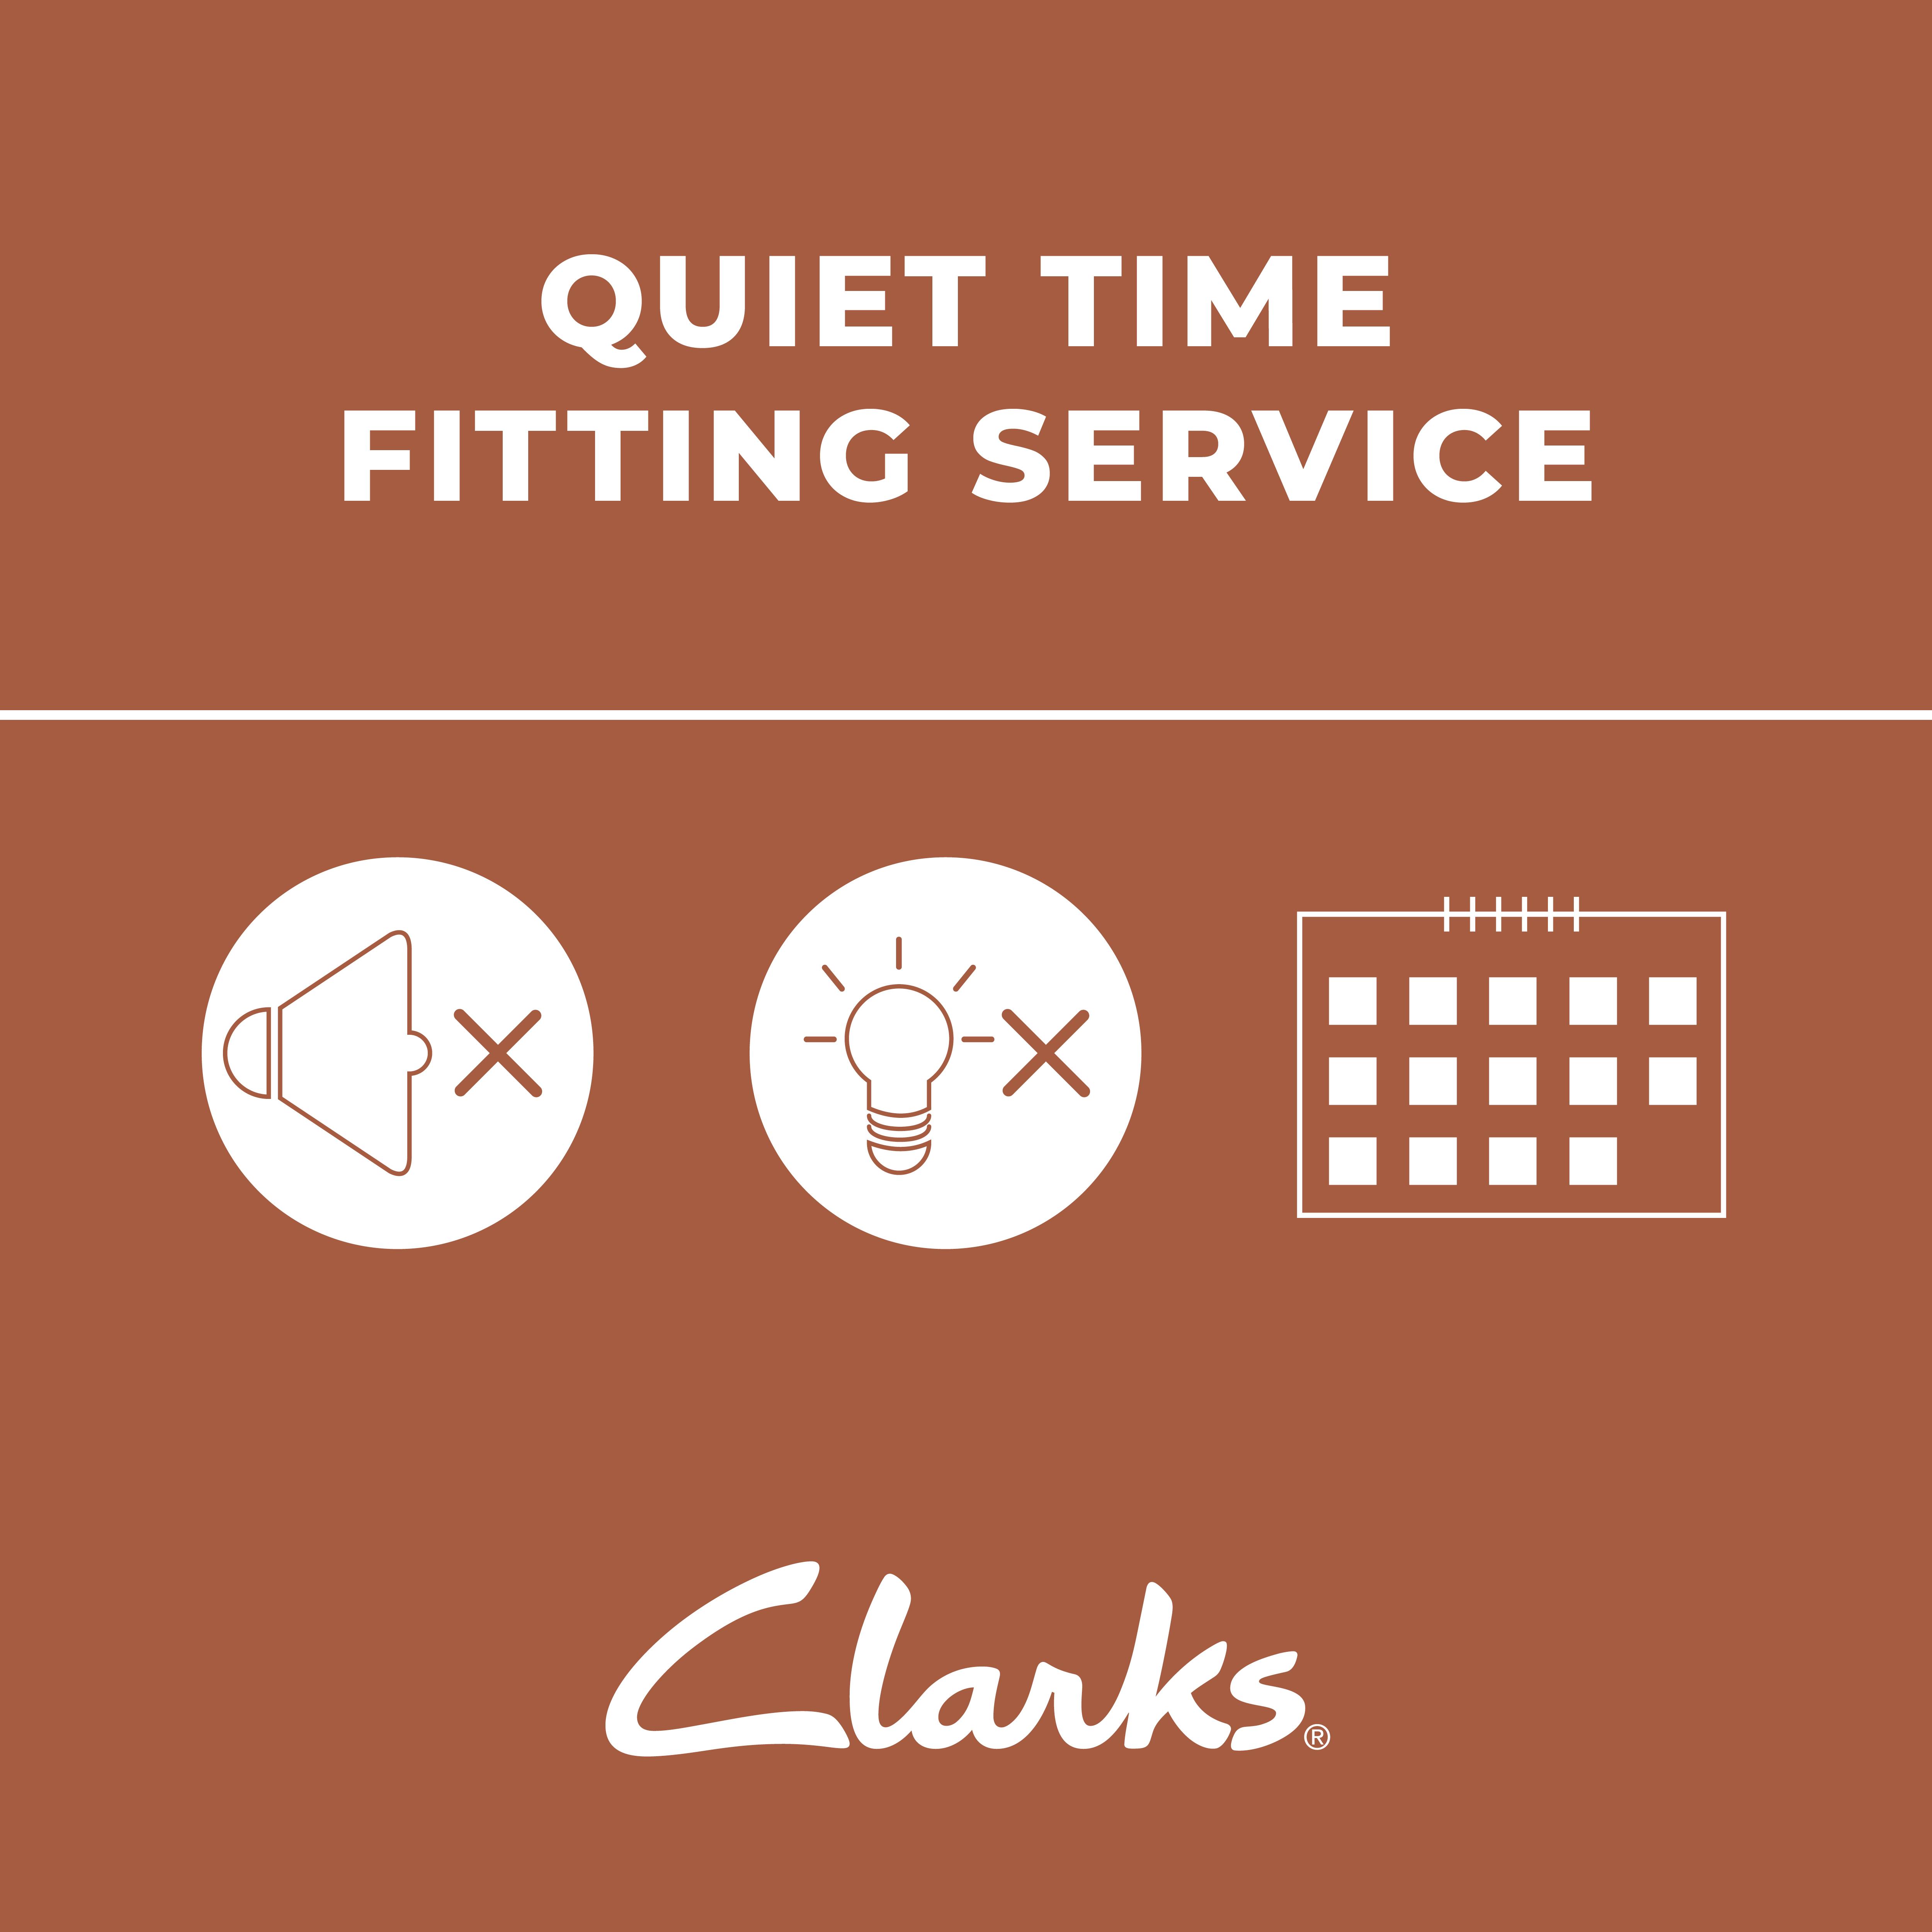 clarks quiet time